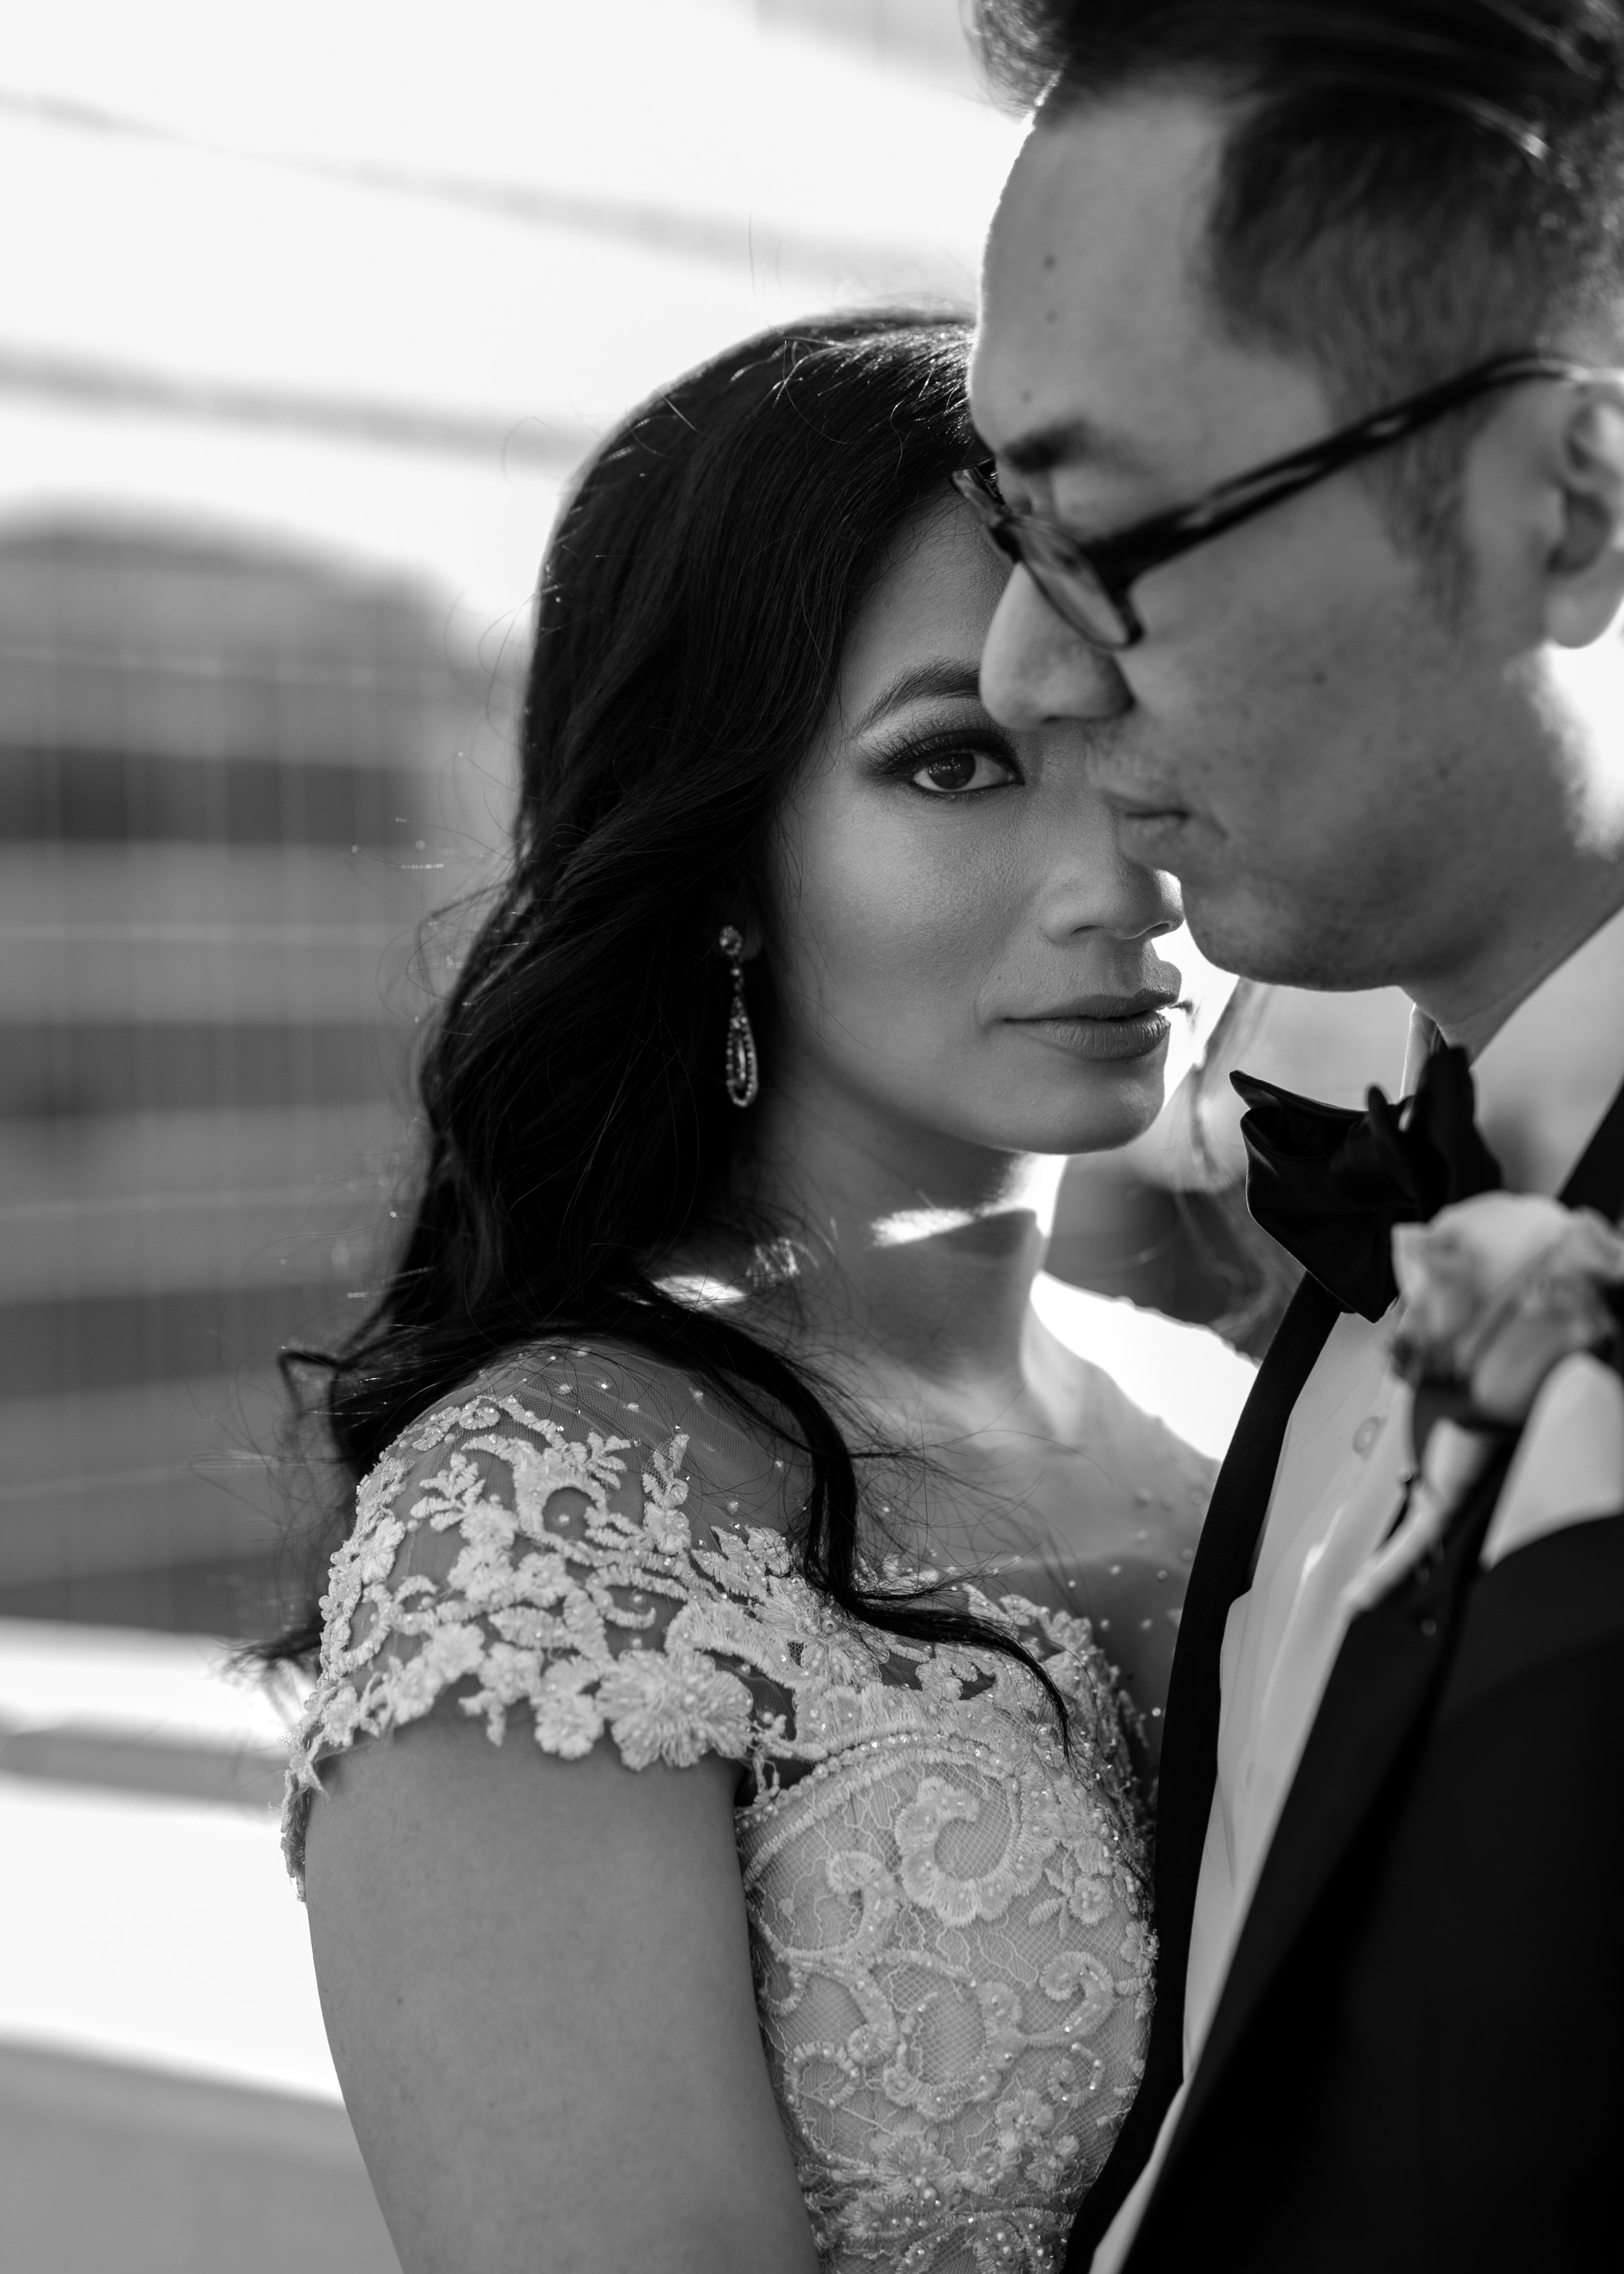 herastudios_wedding_chandy_dale_hera_selects-68.jpg